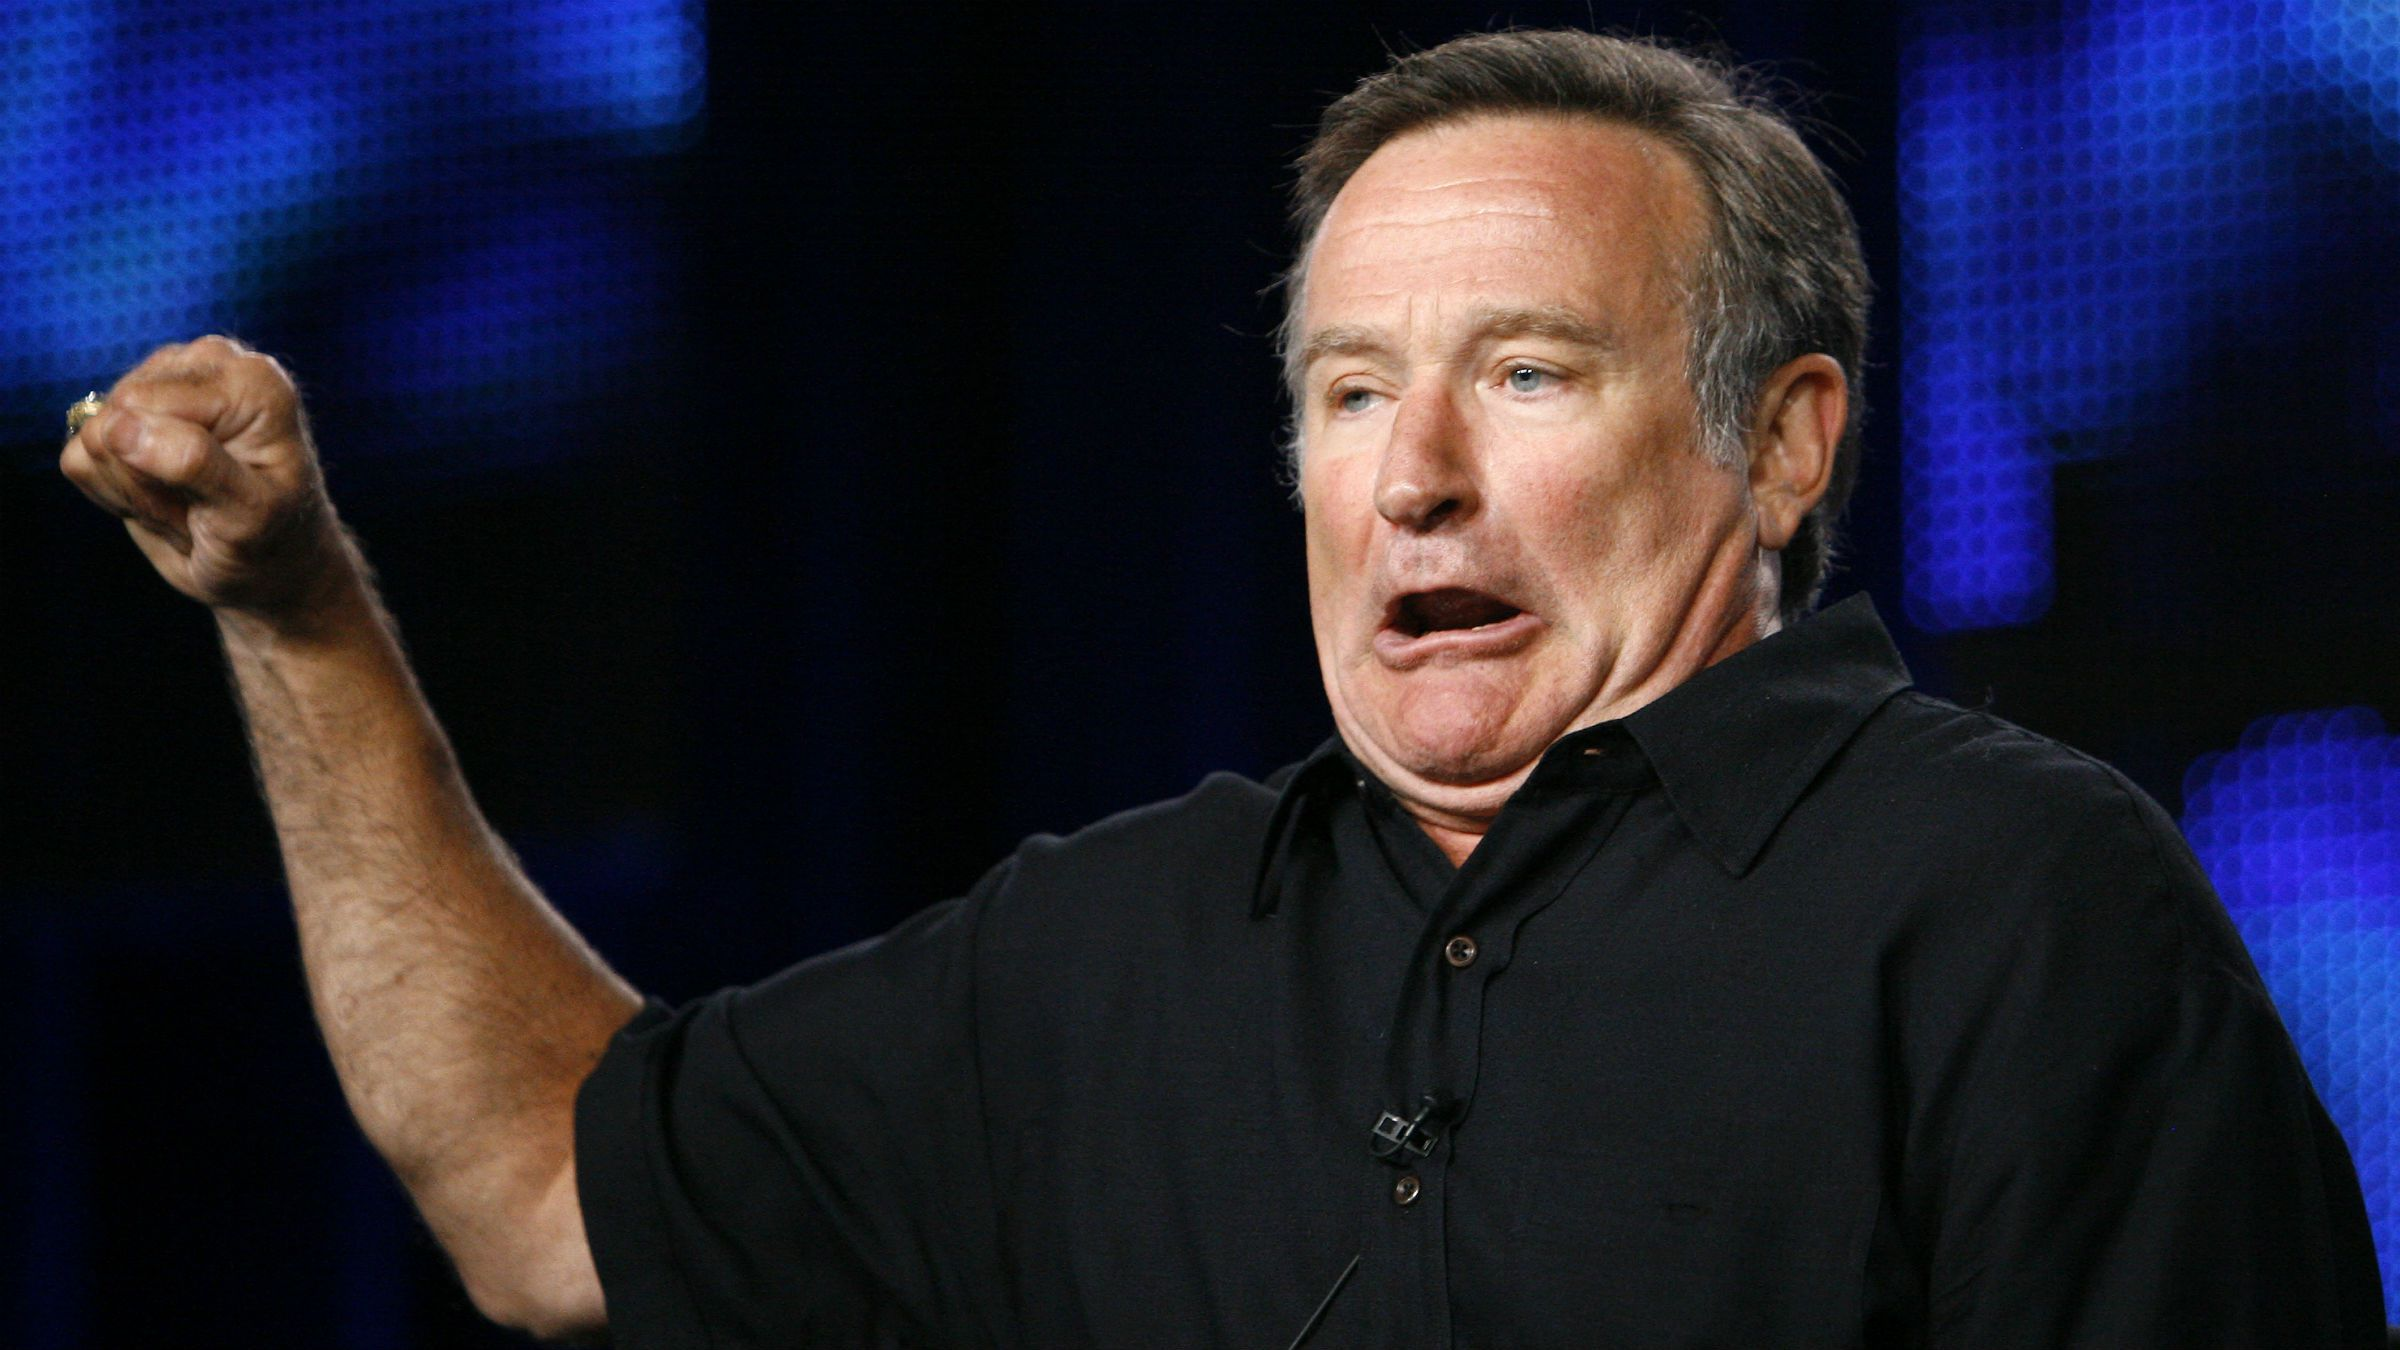 Robin Williams acting